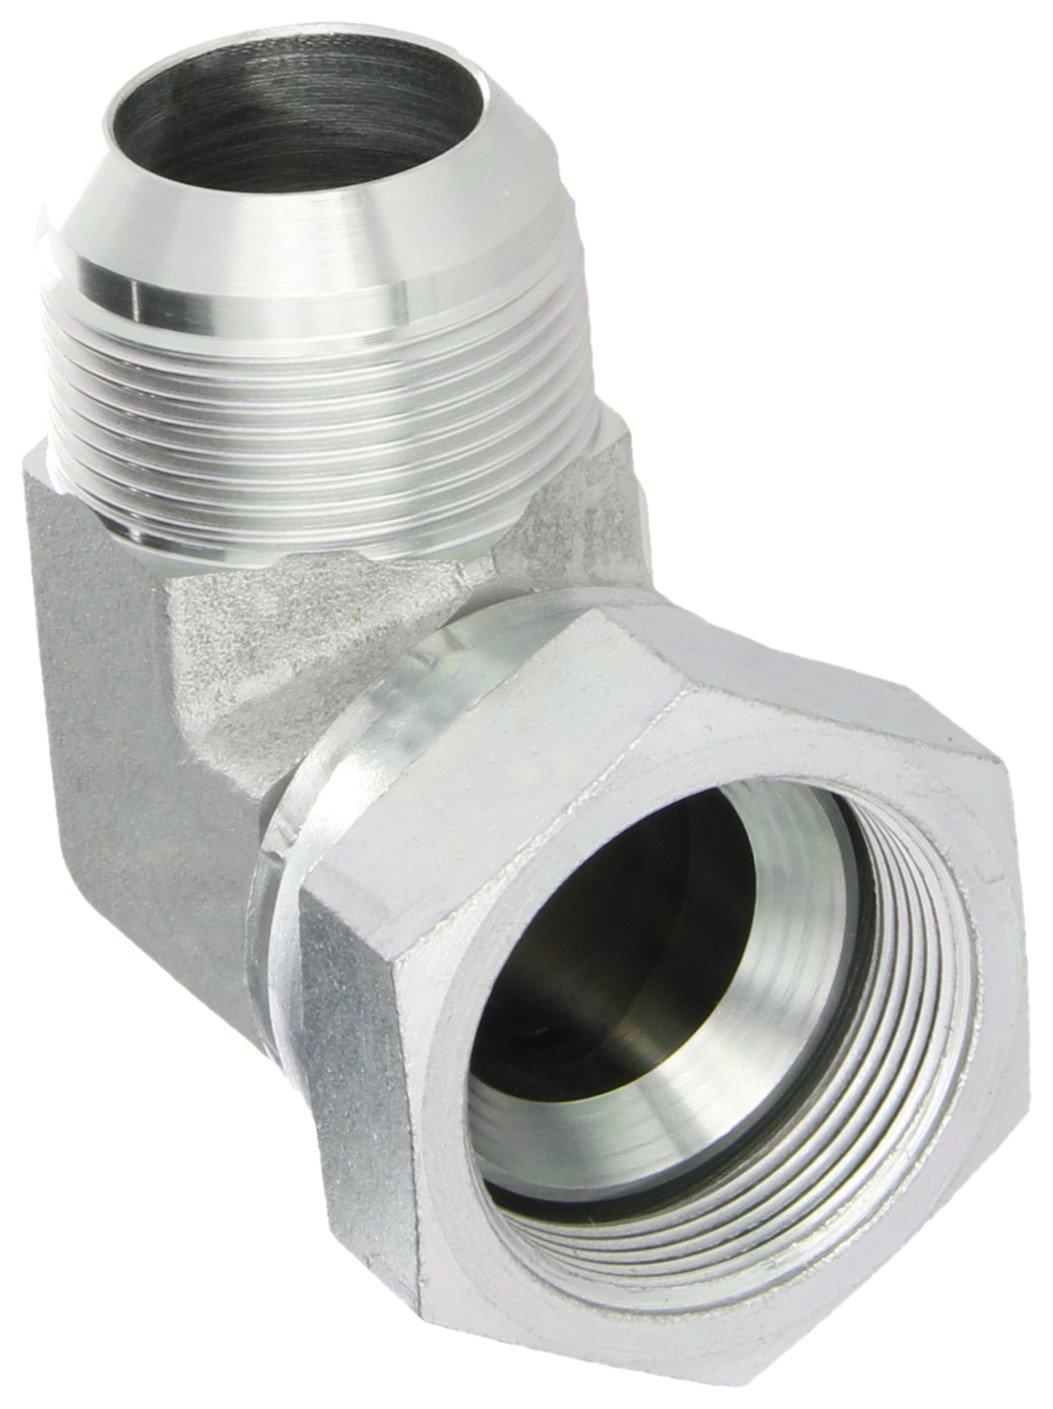 Eaton Weatherhead C5506X20 Carbon Steel Degree JIC Max 62% OFF SAE 37 Al sold out. Flar